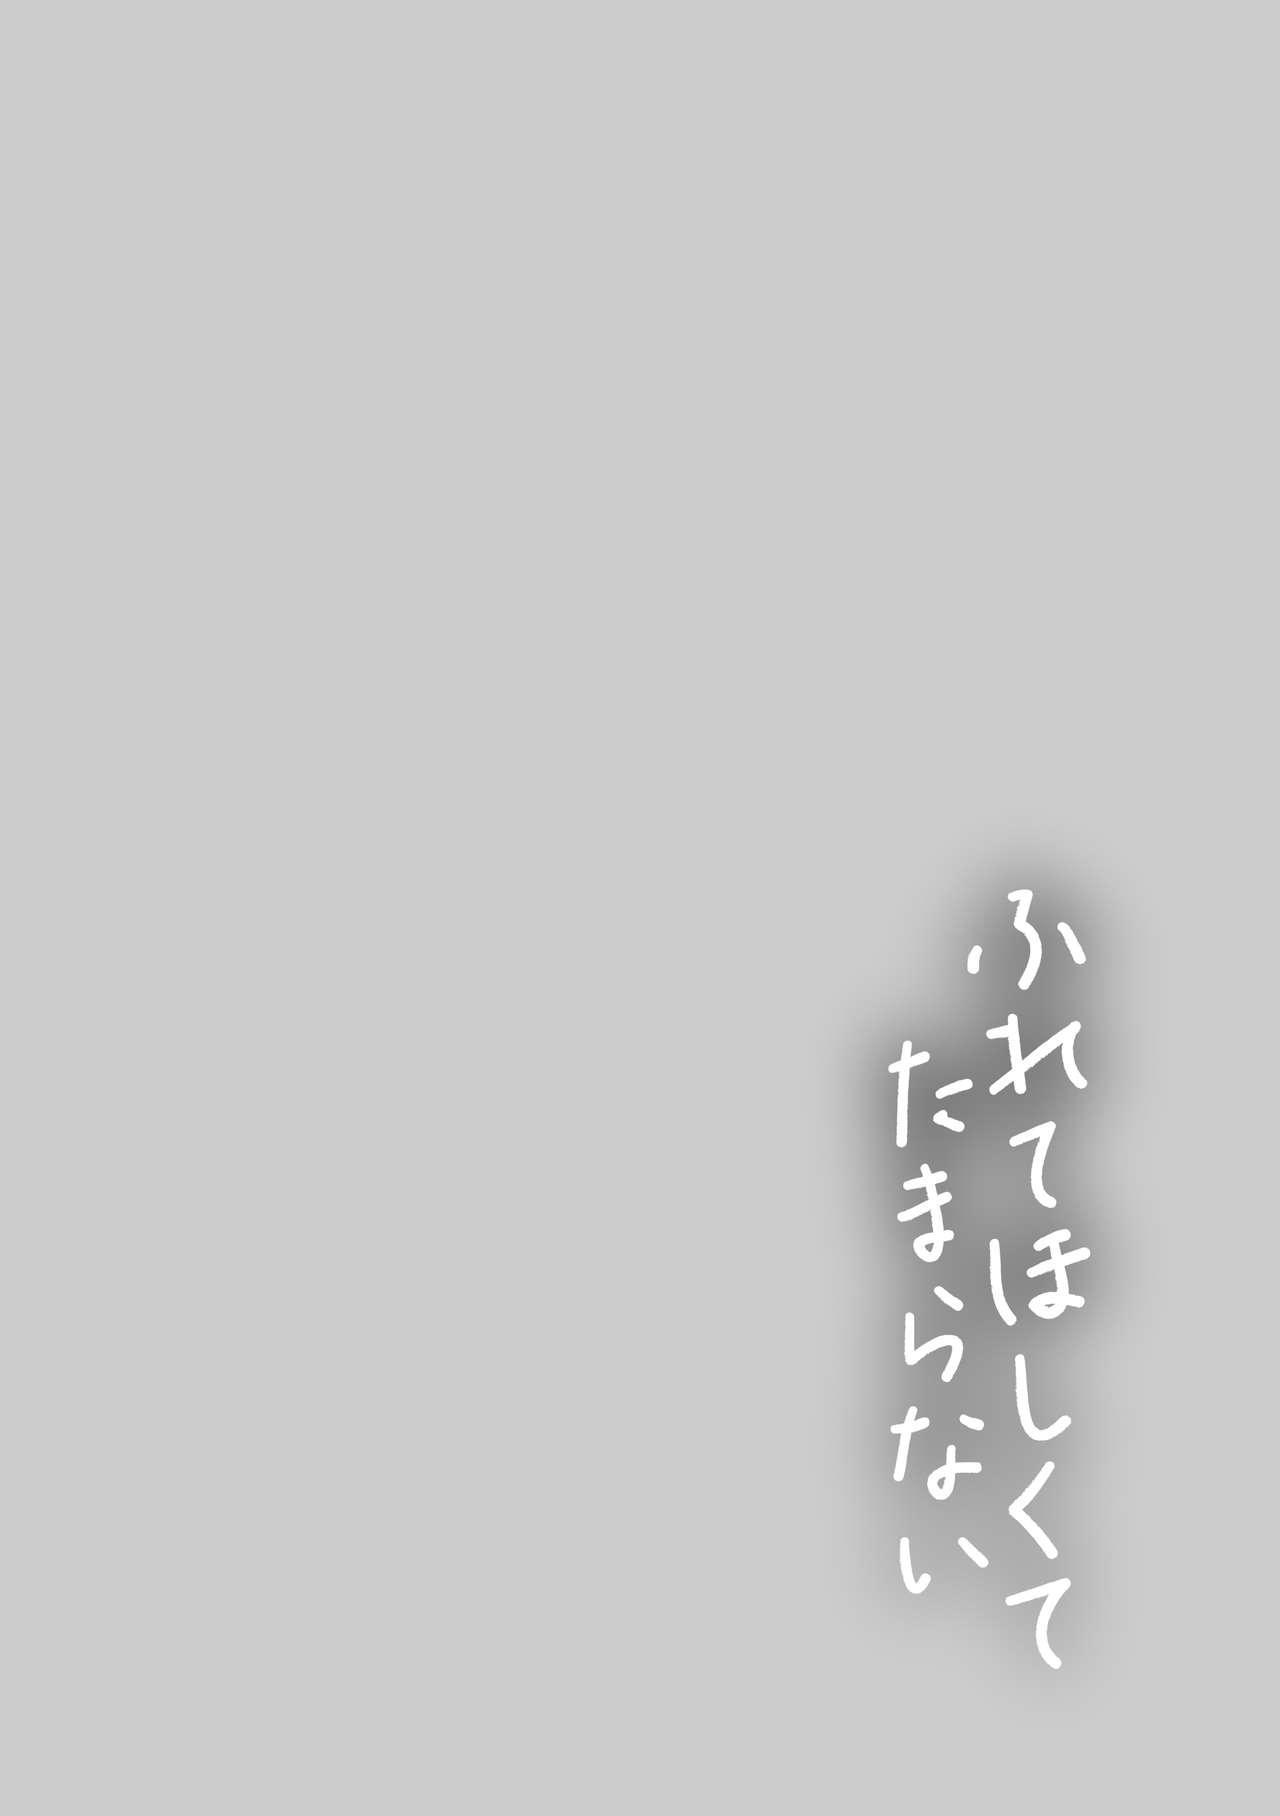 Furete Hoshikute Tamaranai 111